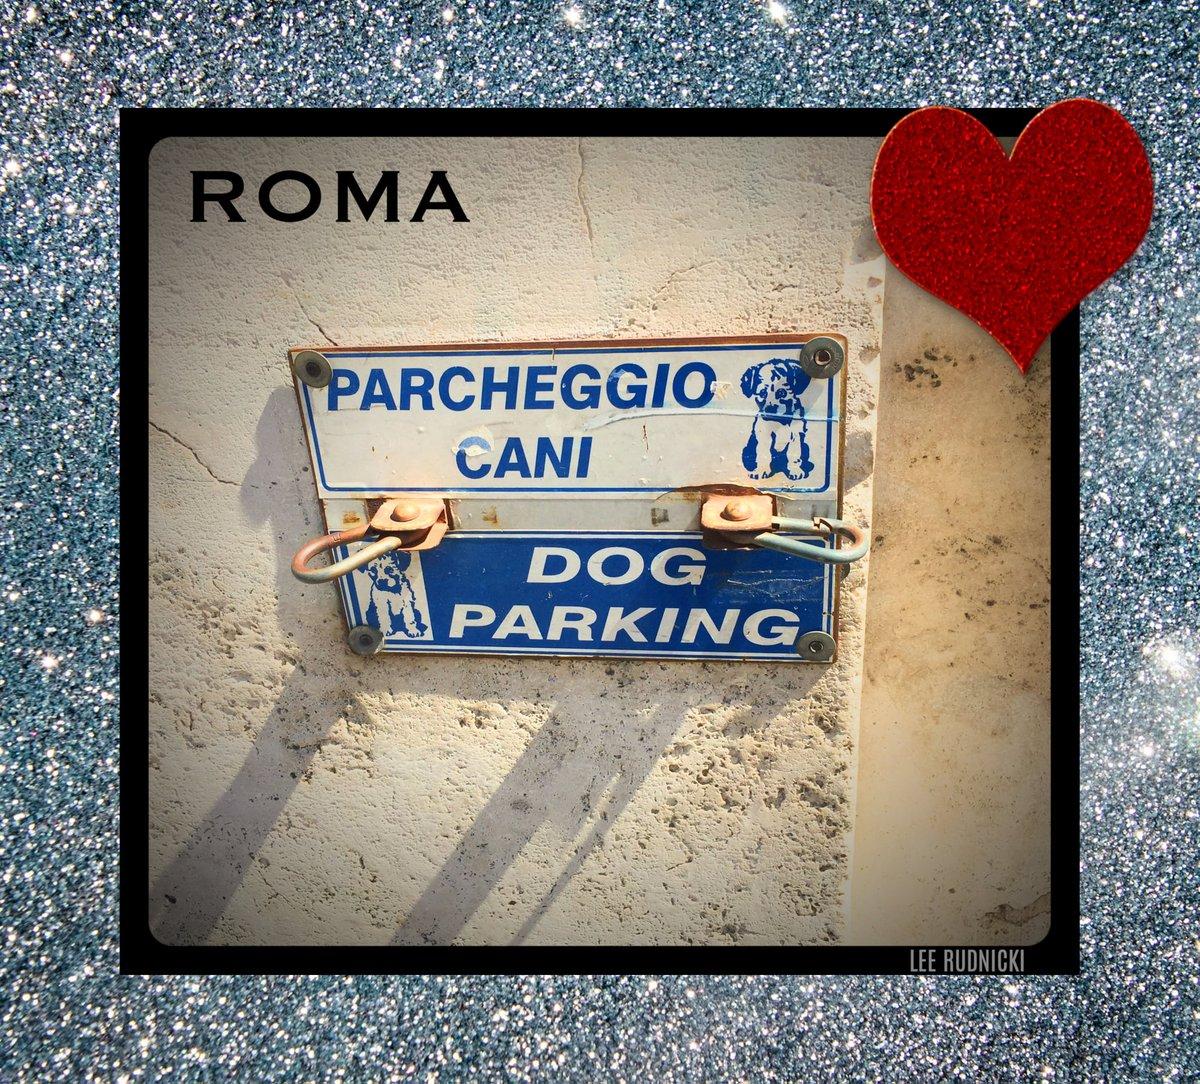 Roma Dog Parking #leerudnicki #photography #rome #roma #italy #italia #travel #ig #art #love  #picoftheday #igersroma #instagood #romeitaly #photooftheday #travelphotography #lazio #europe #igersitalia #paris #like #visitrome #instagram #history #photo #follow #travelgram #dog https://t.co/NsDGHTYrdj